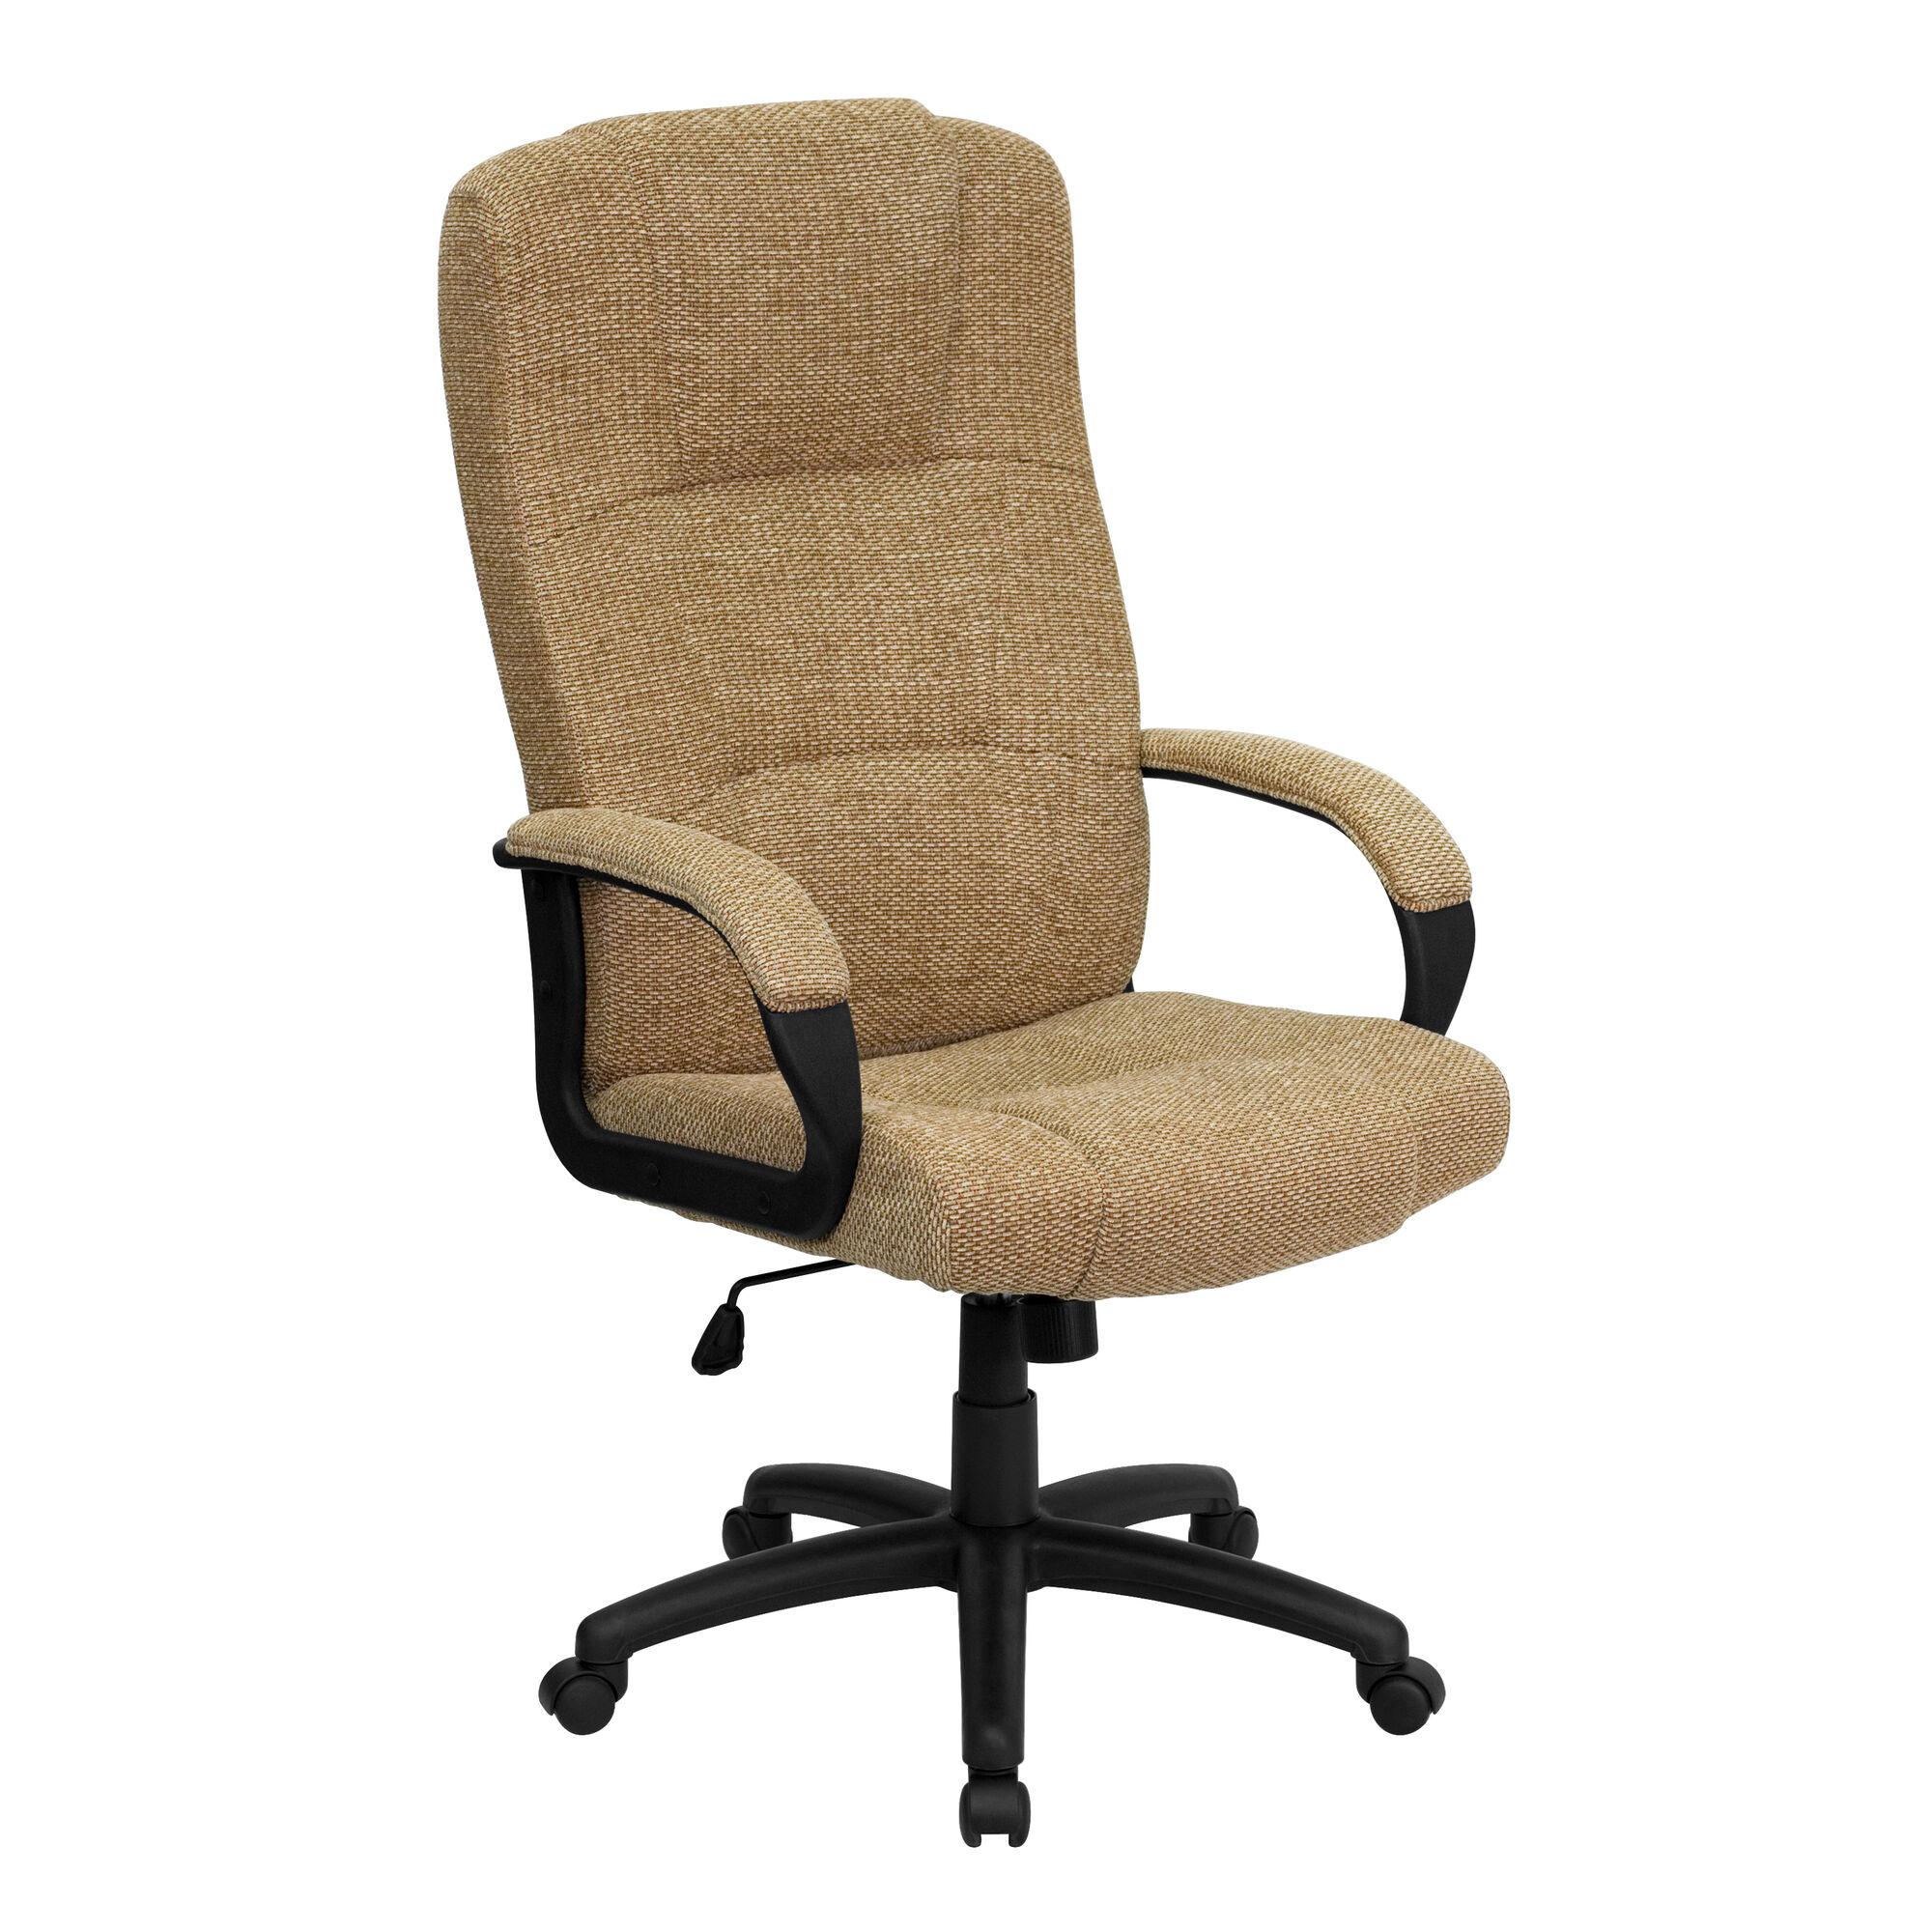 Flash Furniture BT 9022 BGE GG at Bizchair